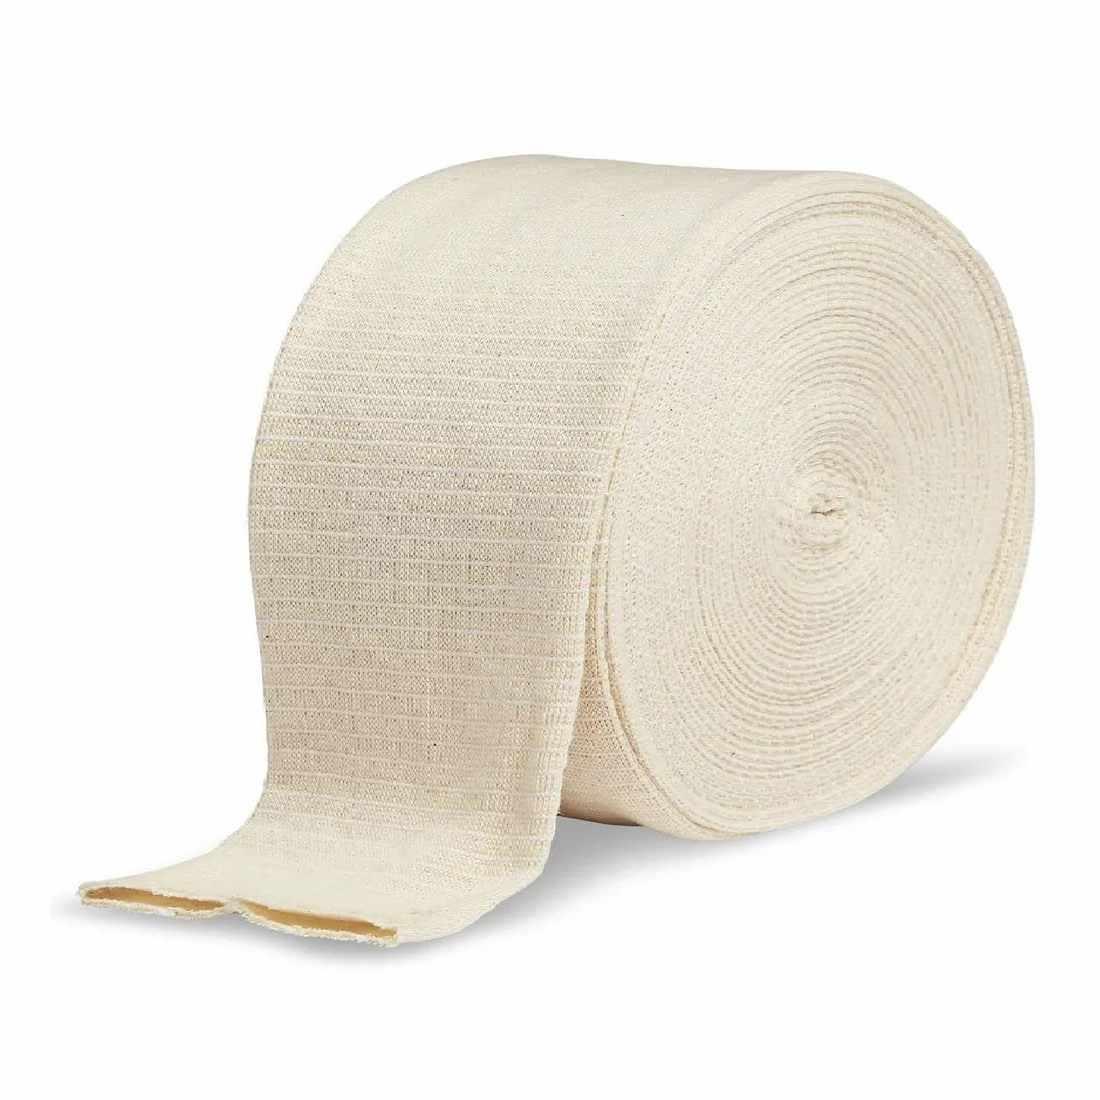 Dermafit Tubular Support Compression Bandage, Size F